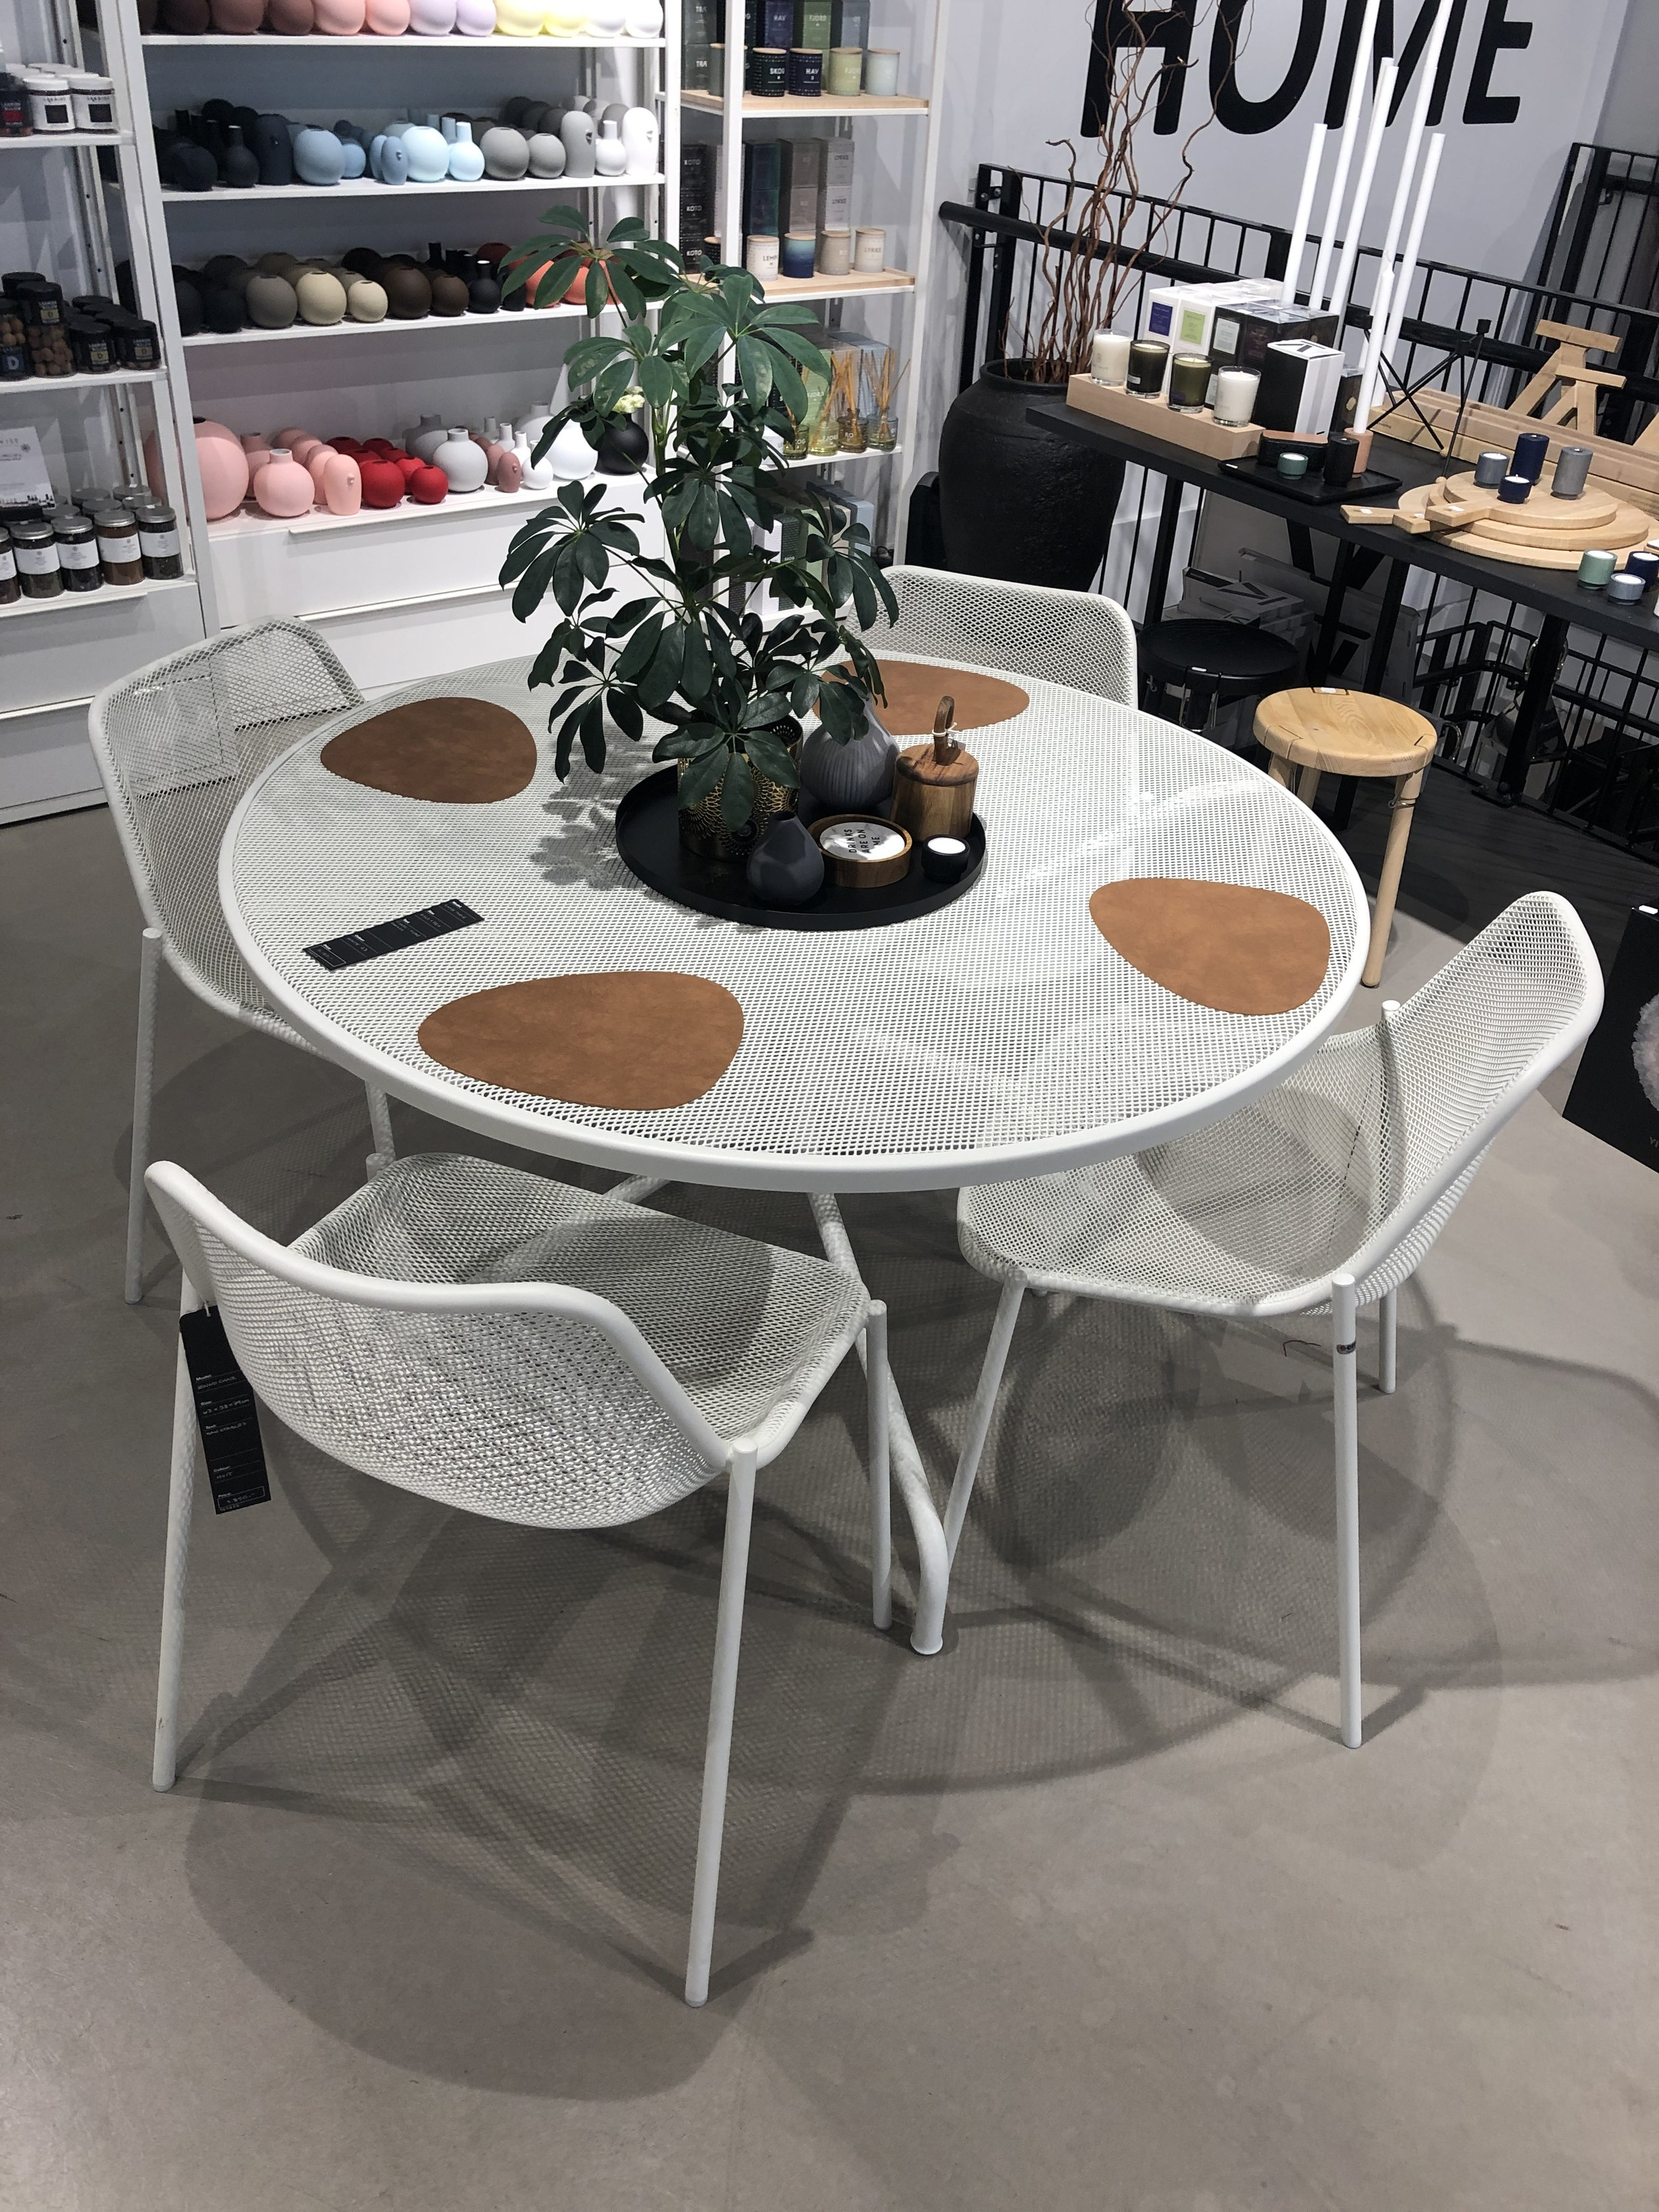 Cambi bord + round stol: -**% - Bord: Ø120cm, 4 stoler. Selges samlet.